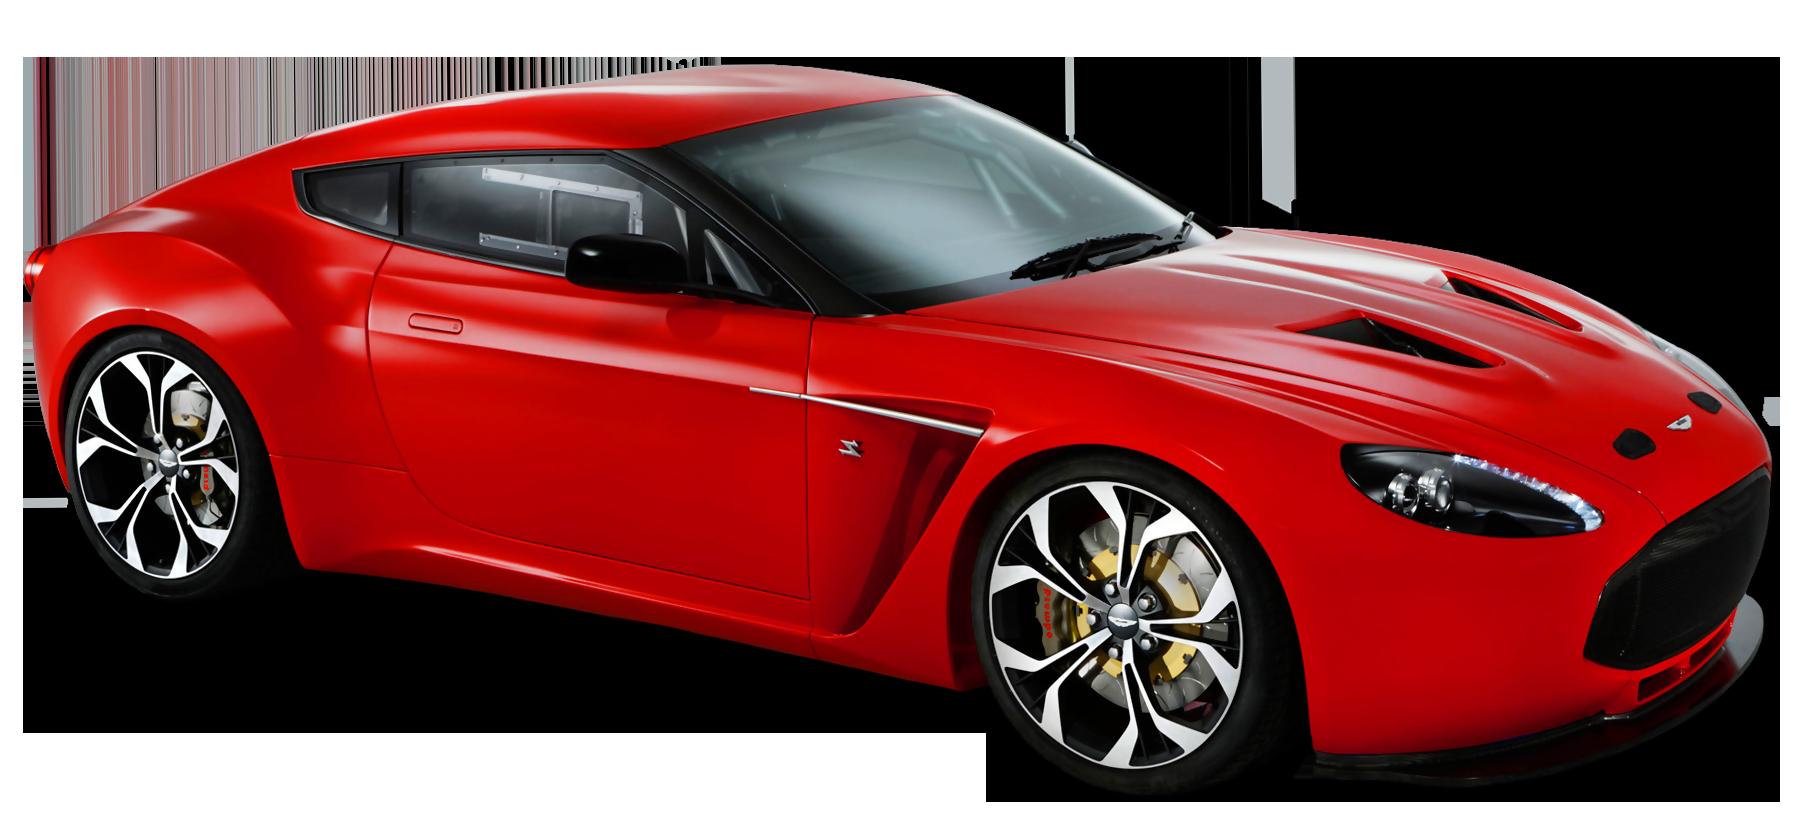 Aston Martin Car PNG Car Clipart Best WEB Clipart.